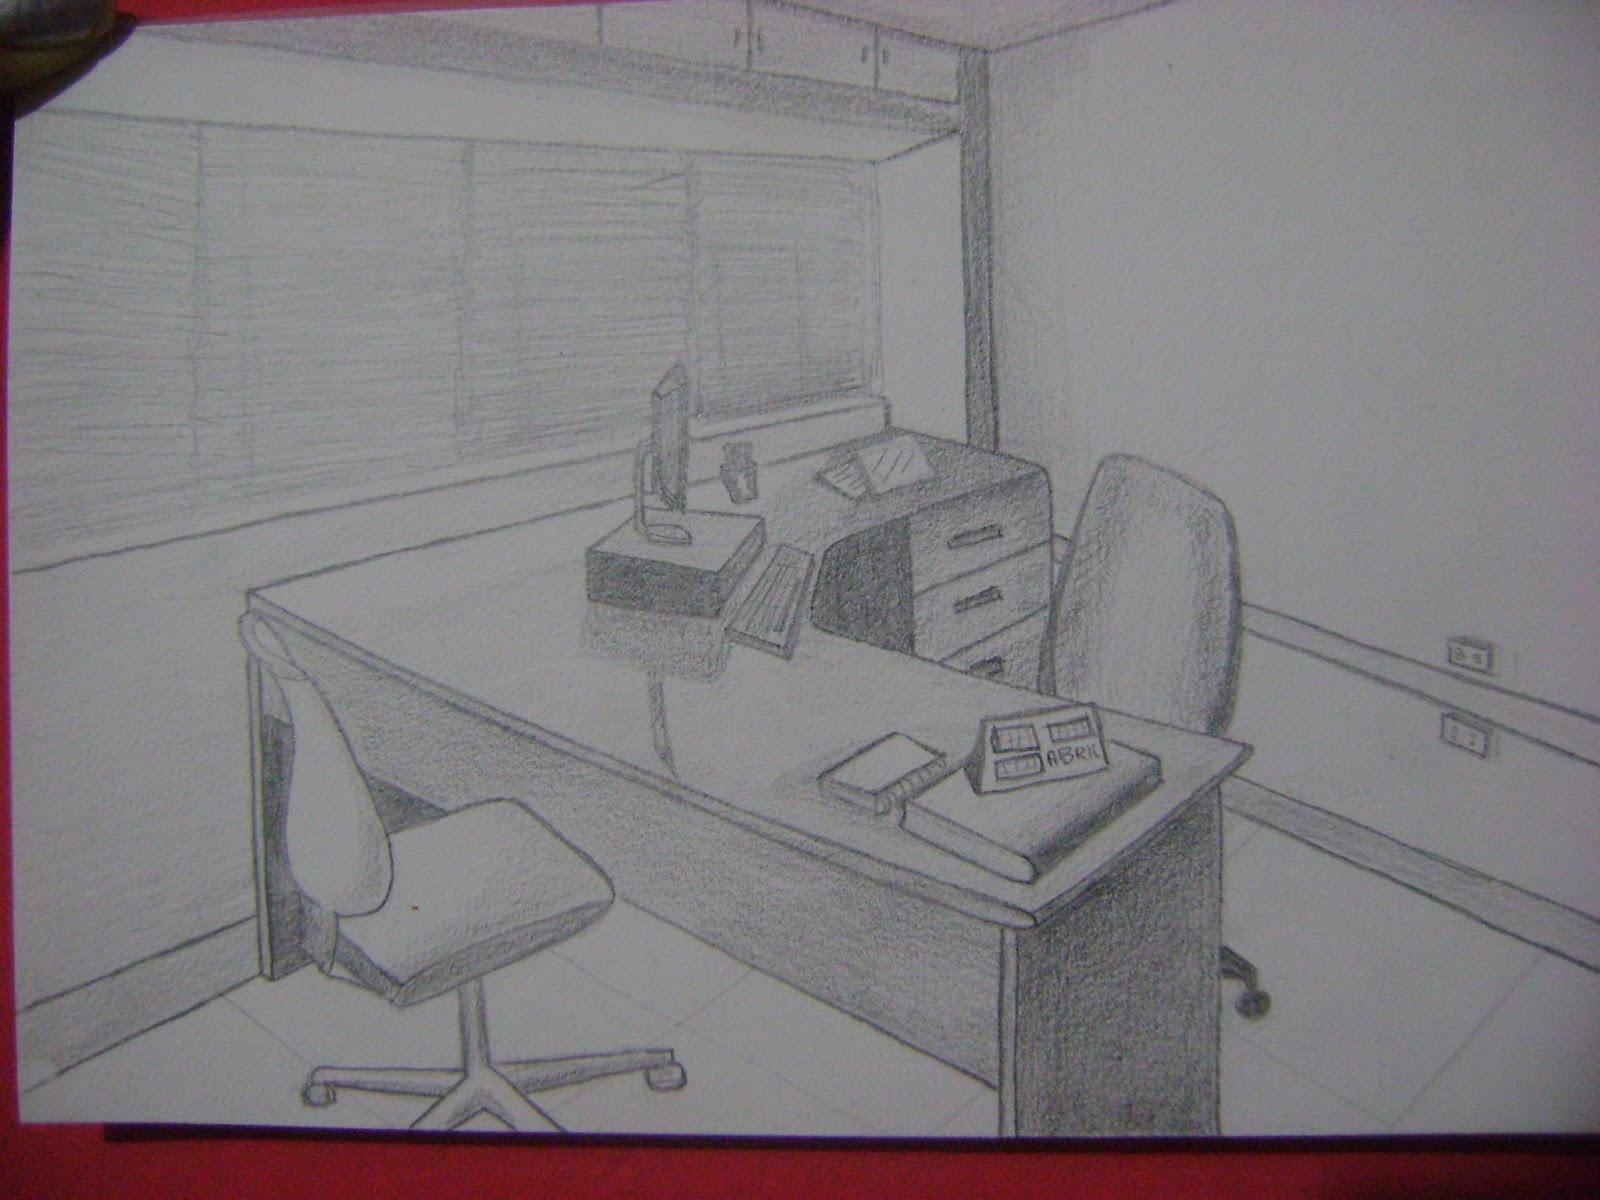 Dibujo perspectiva y color apuntes lorena pimentel arana for Dibujo de una oficina moderna